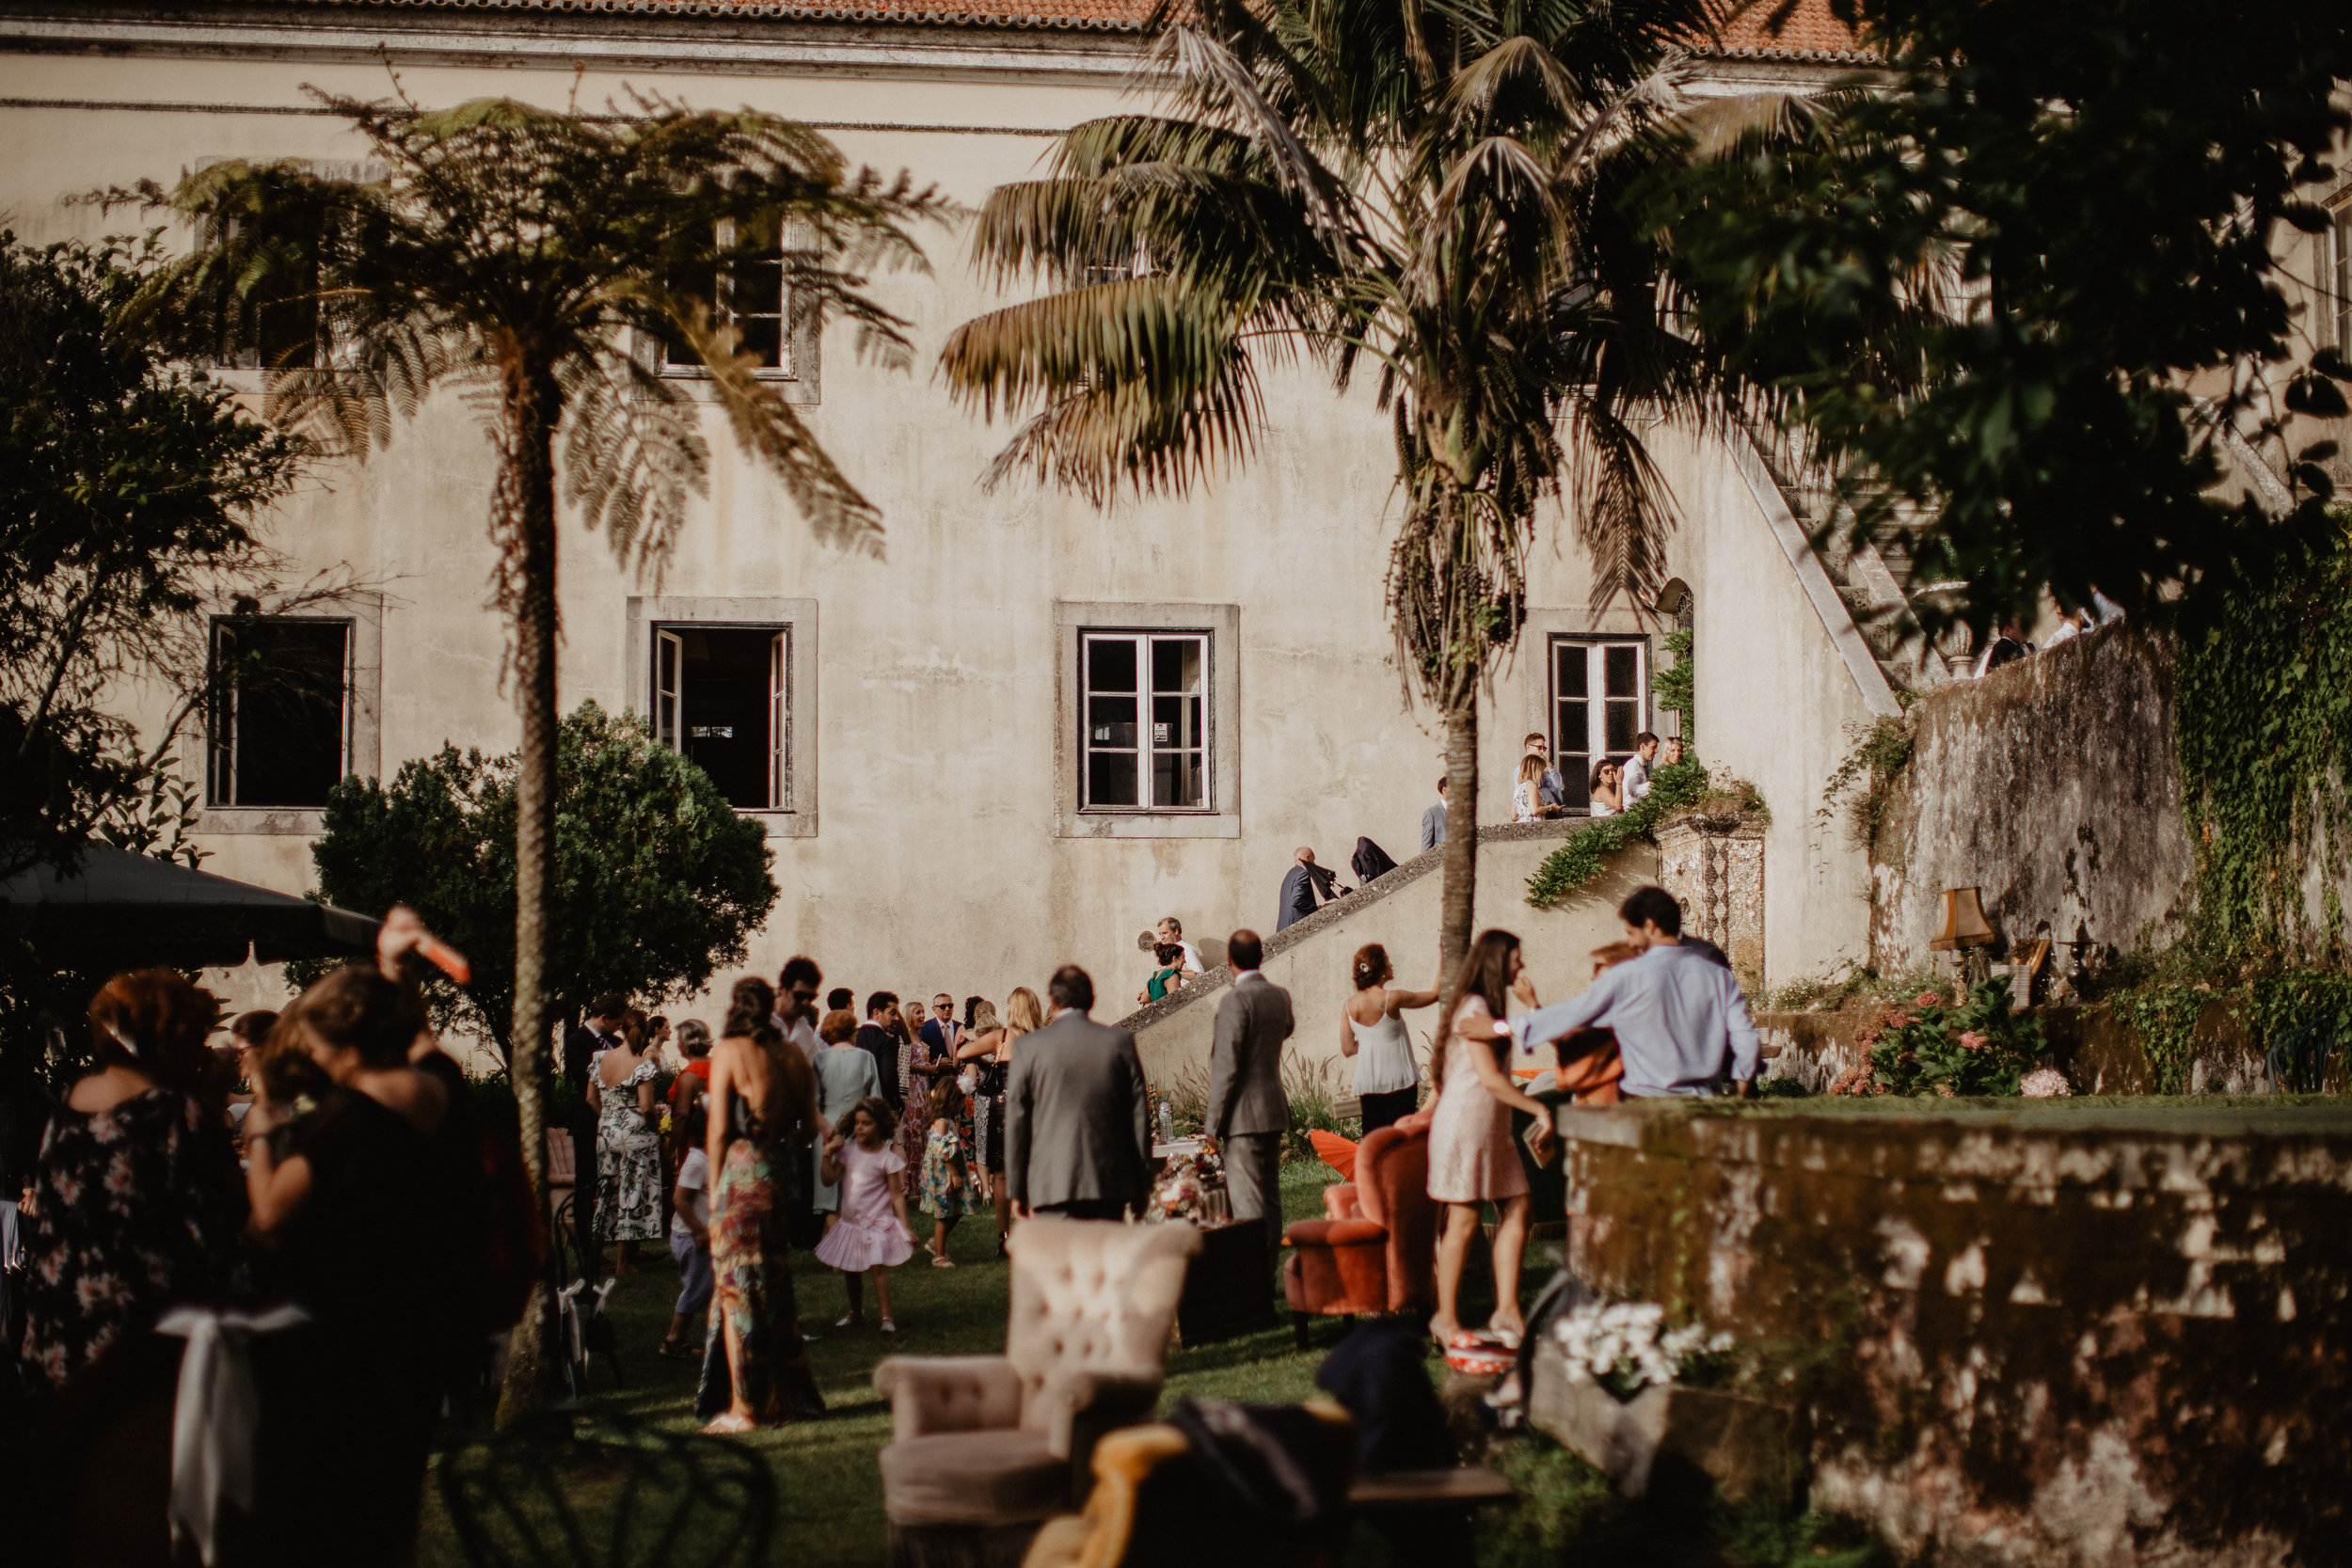 Lapela-photography-wedding-sintra-portugal-98.jpg